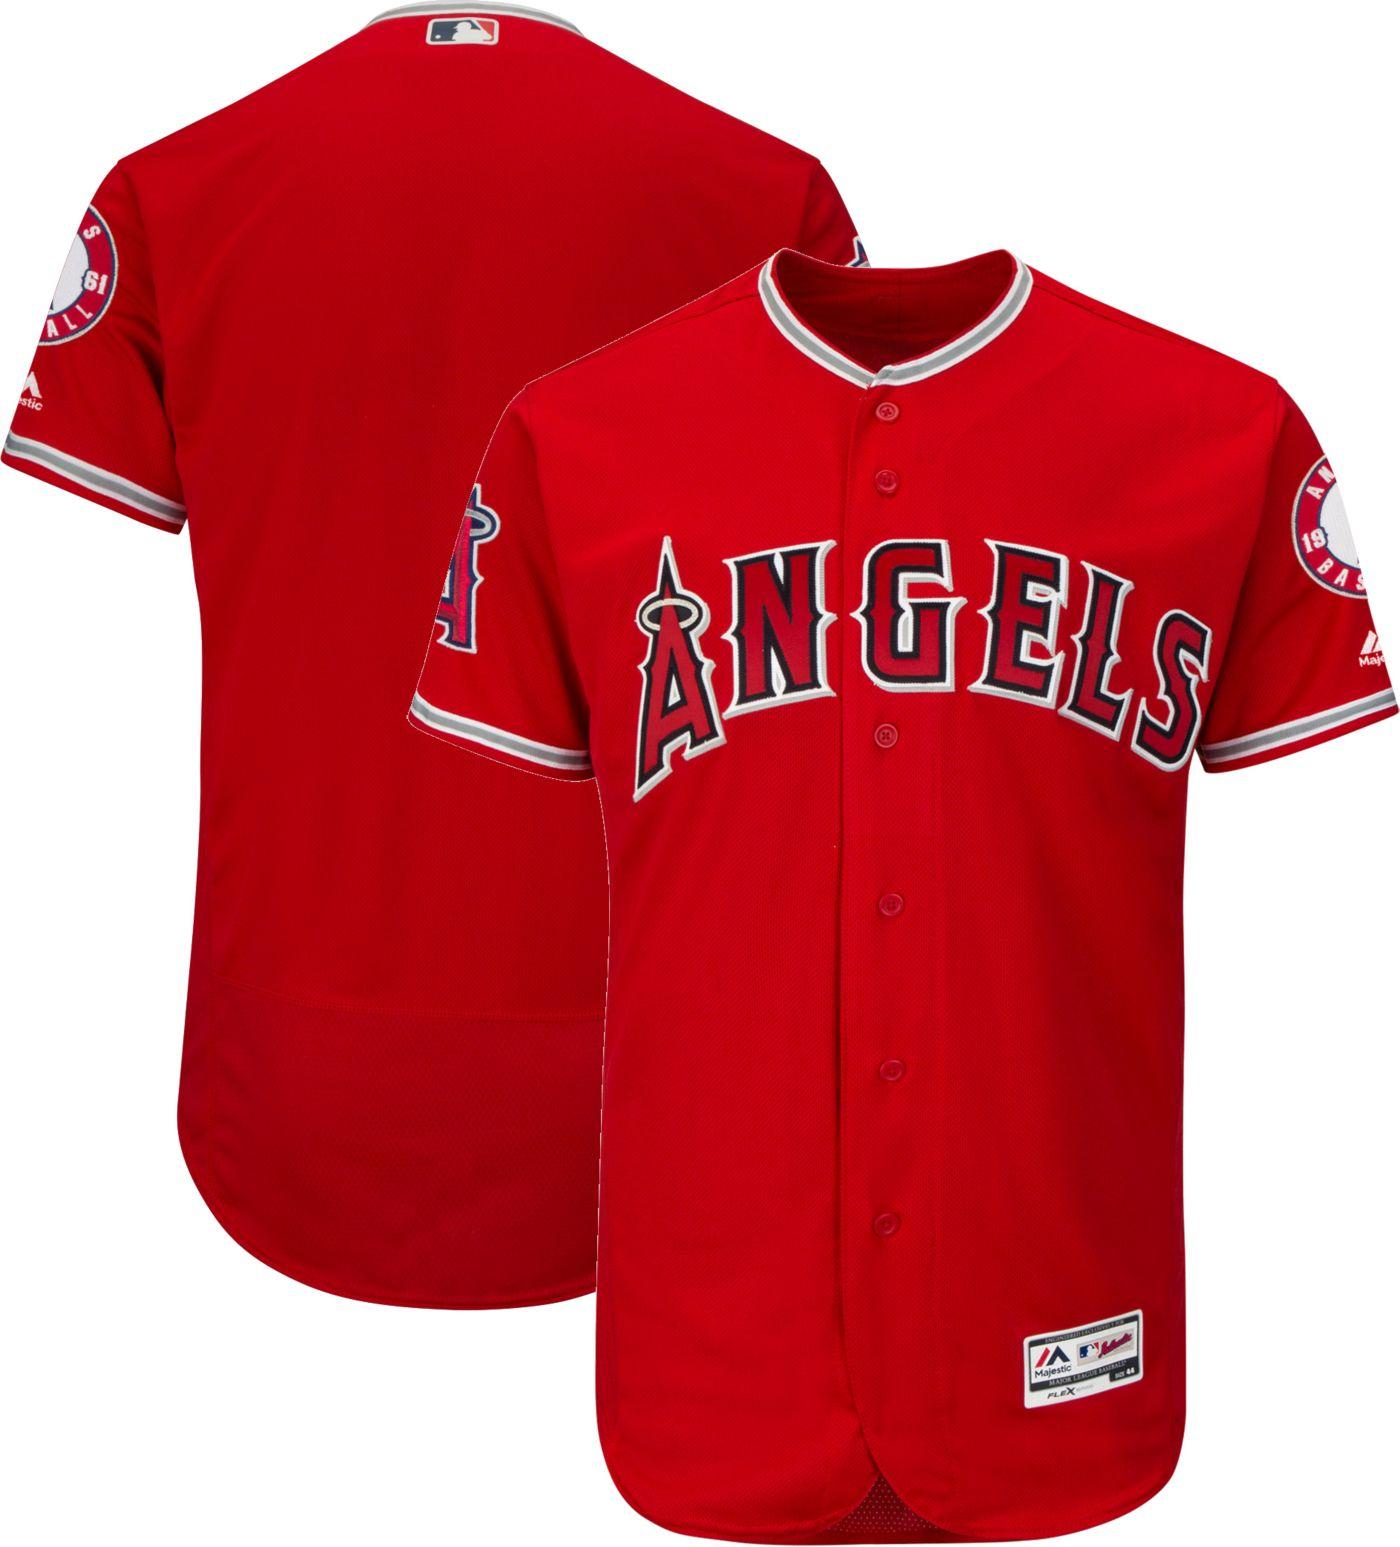 Majestic Men's Authentic Los Angeles Angels Alternate Red Flex Base On-Field Jersey